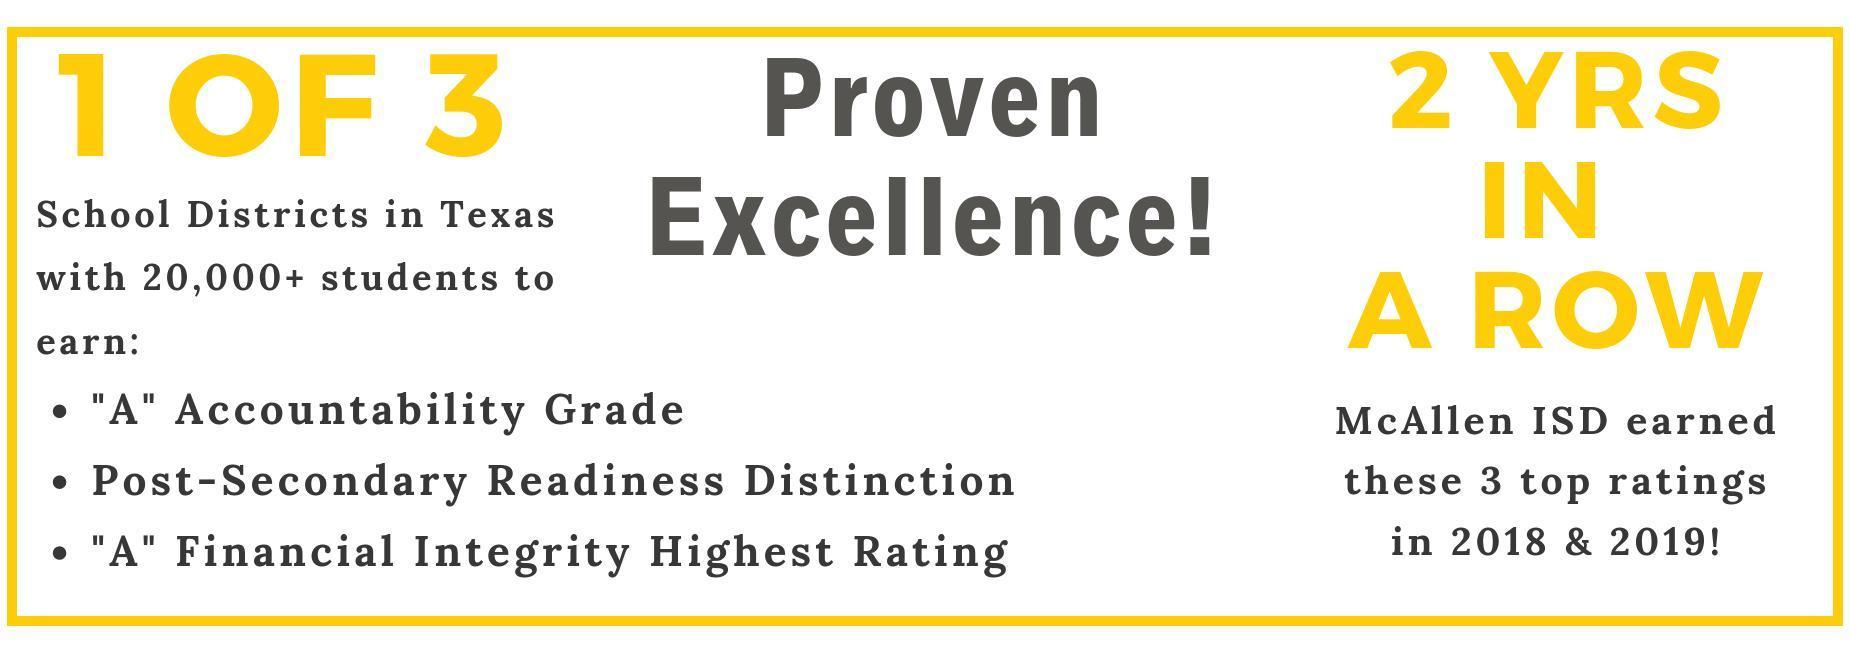 McAllen Independent School District is Proven Excellence